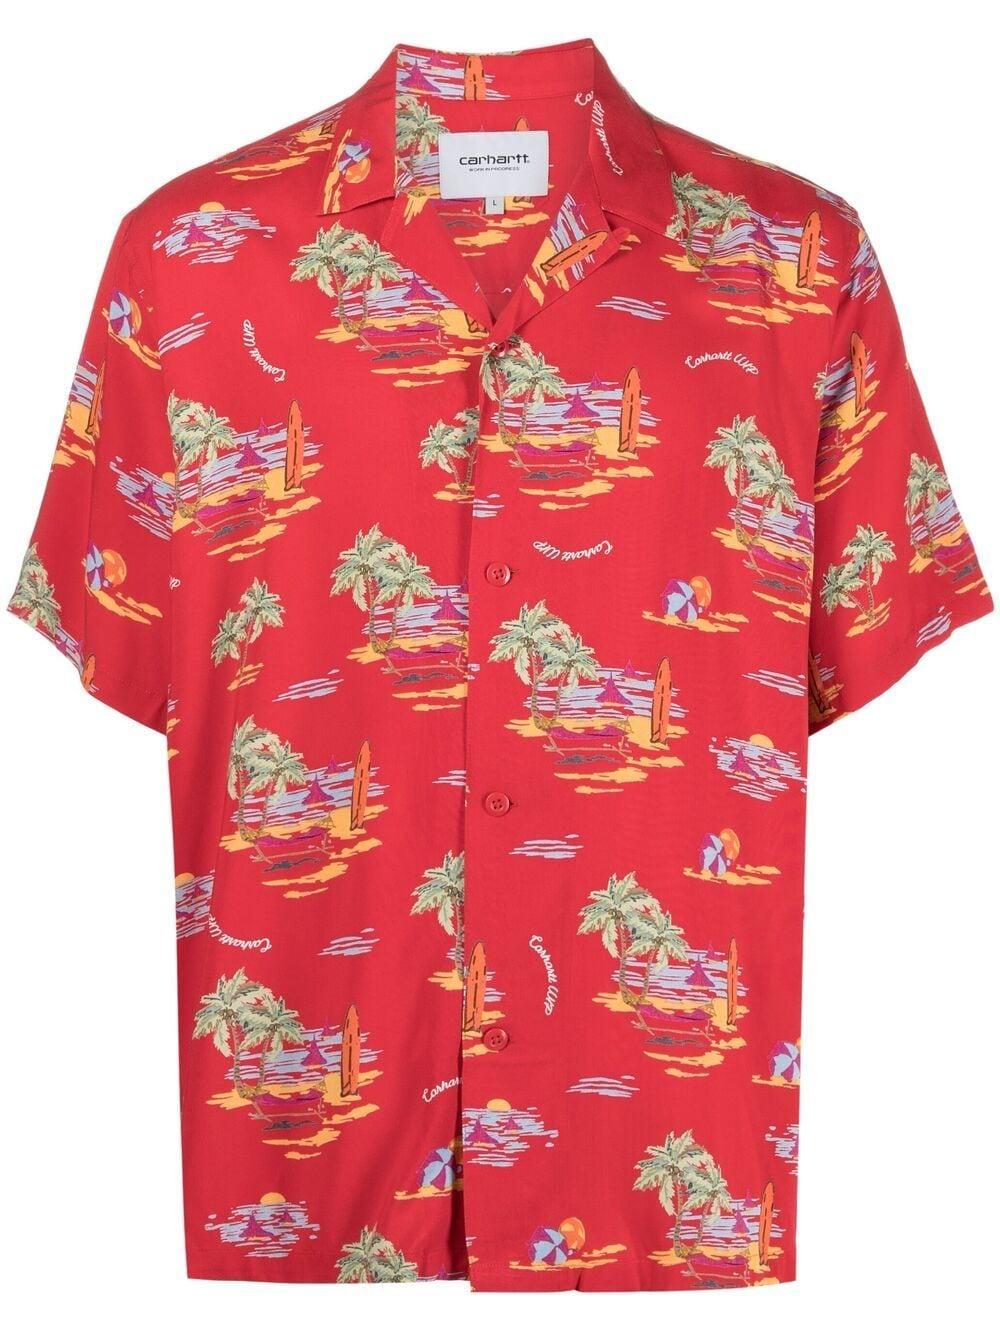 beach shirt man red in cotton CARHARTT WIP | Shirts | I0287950BD.00